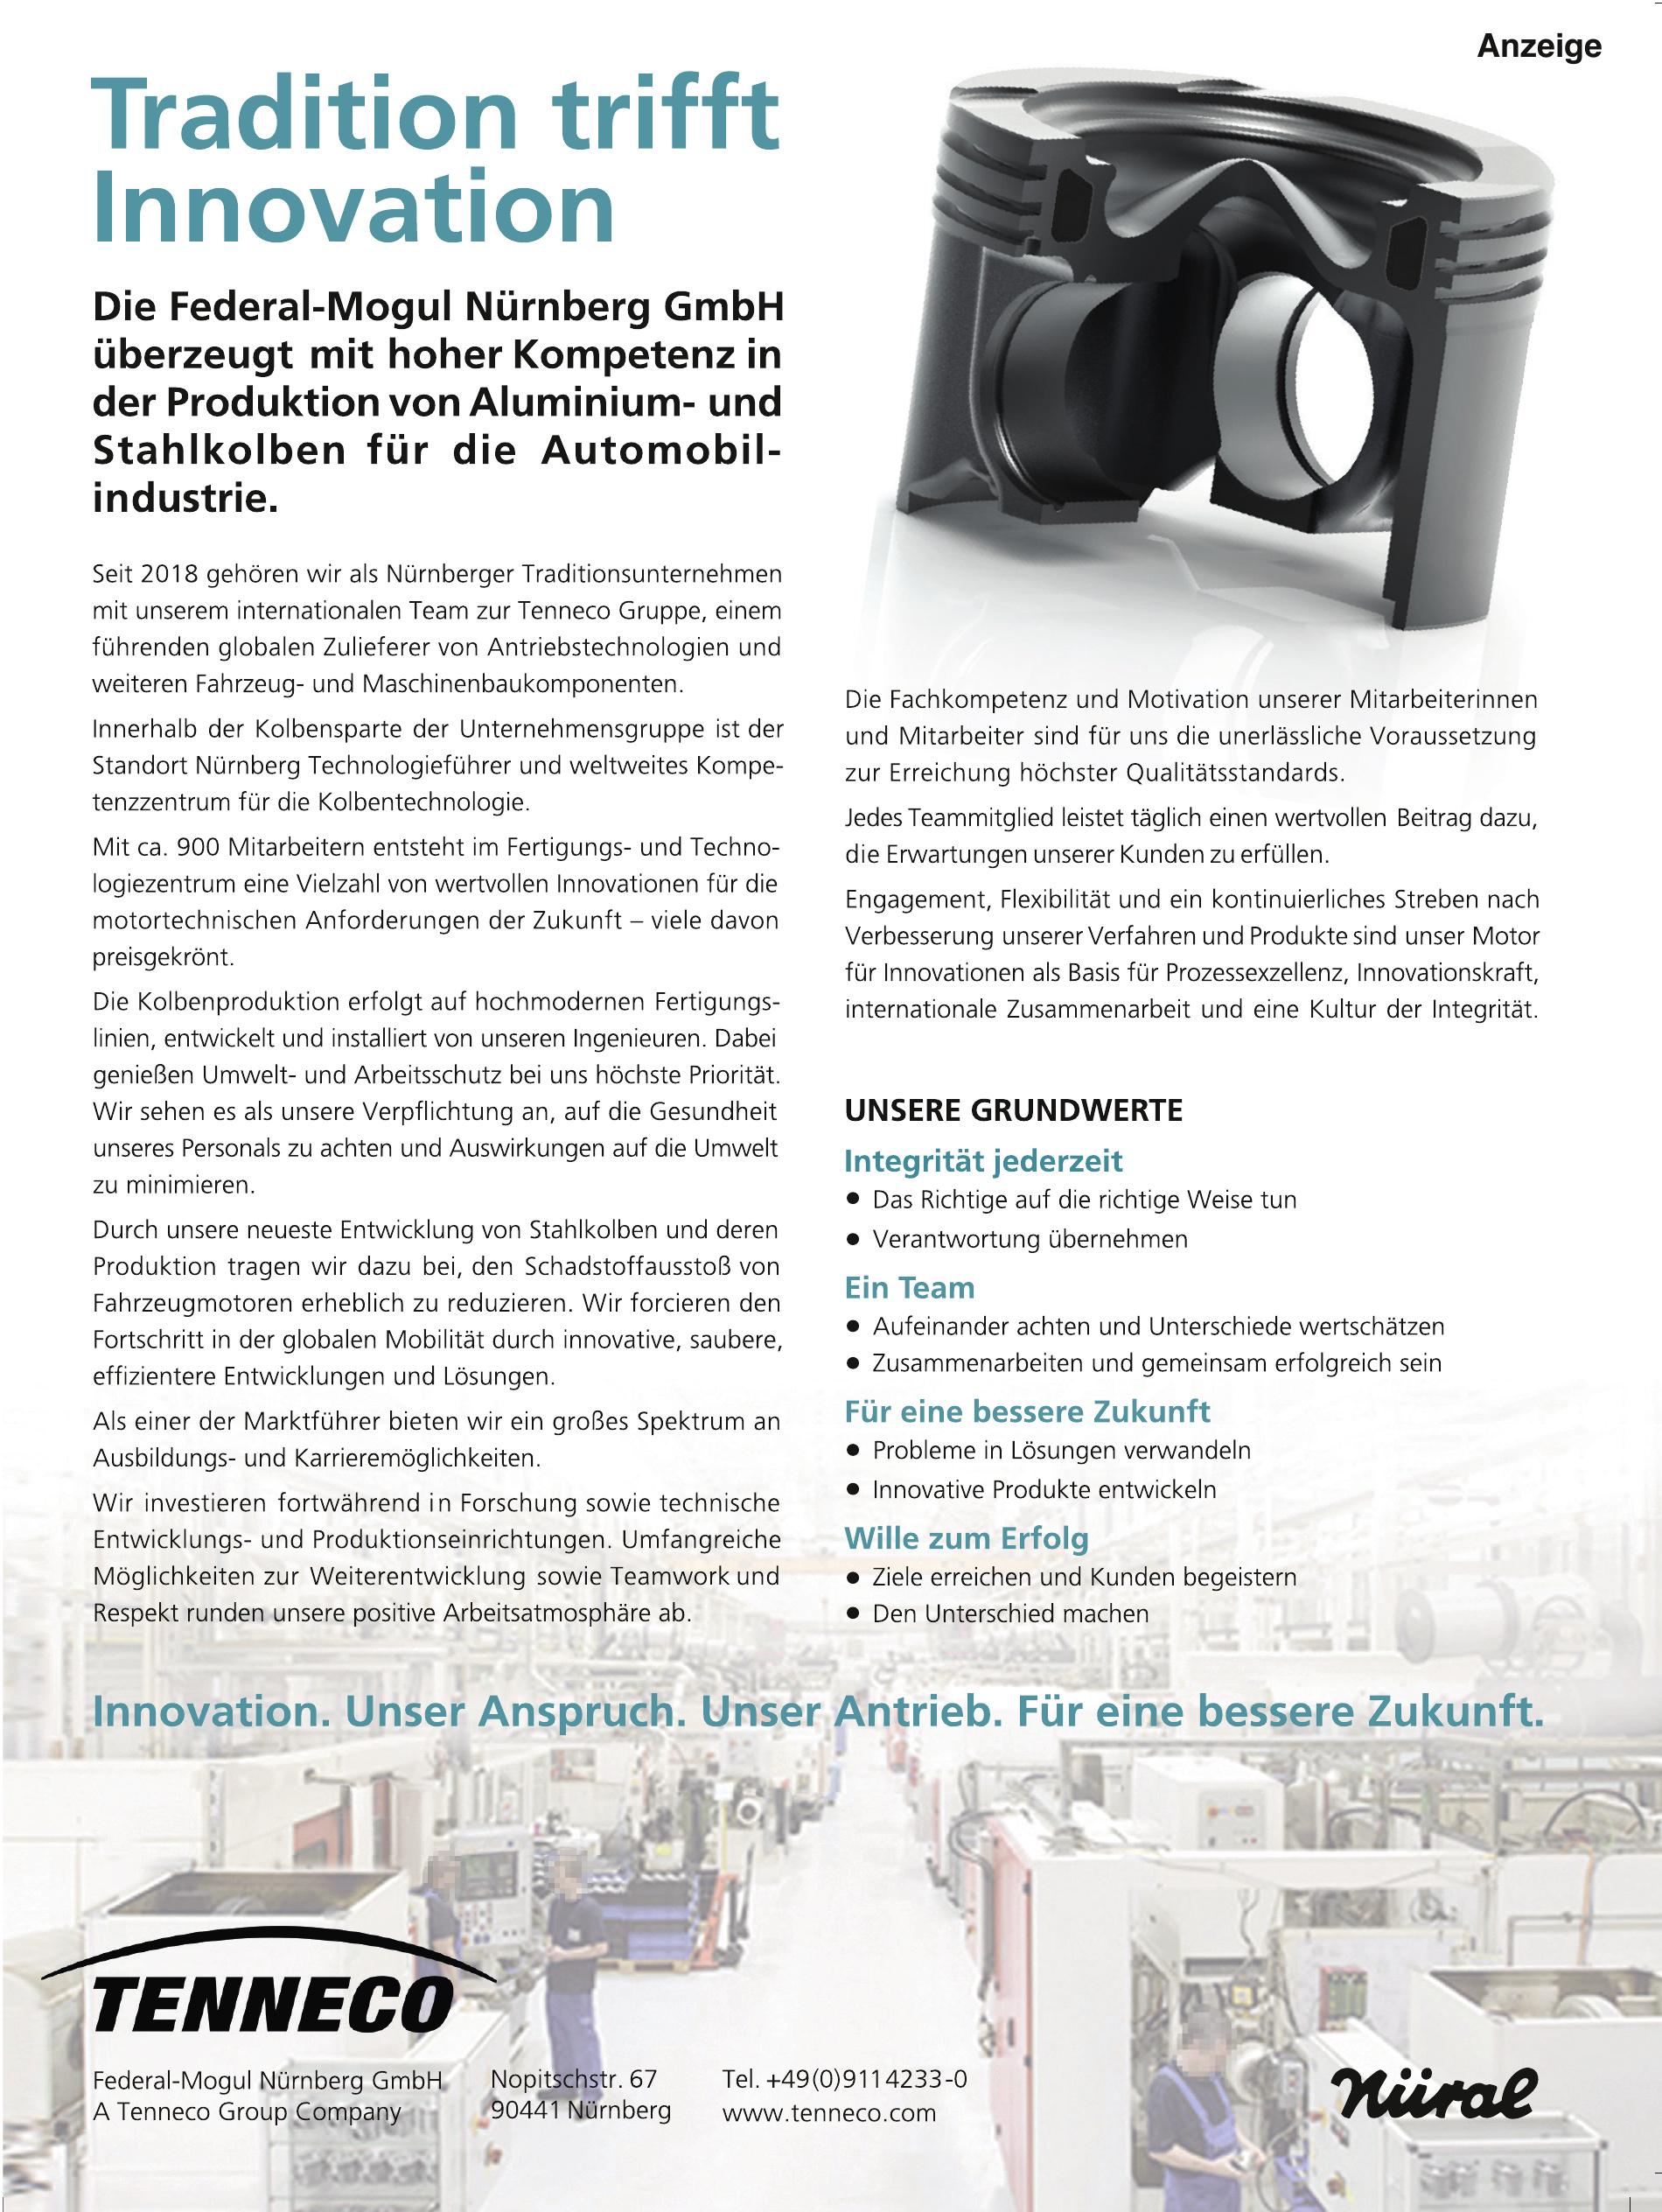 Tenneco Federal-Mogul Nürnberg GmbH